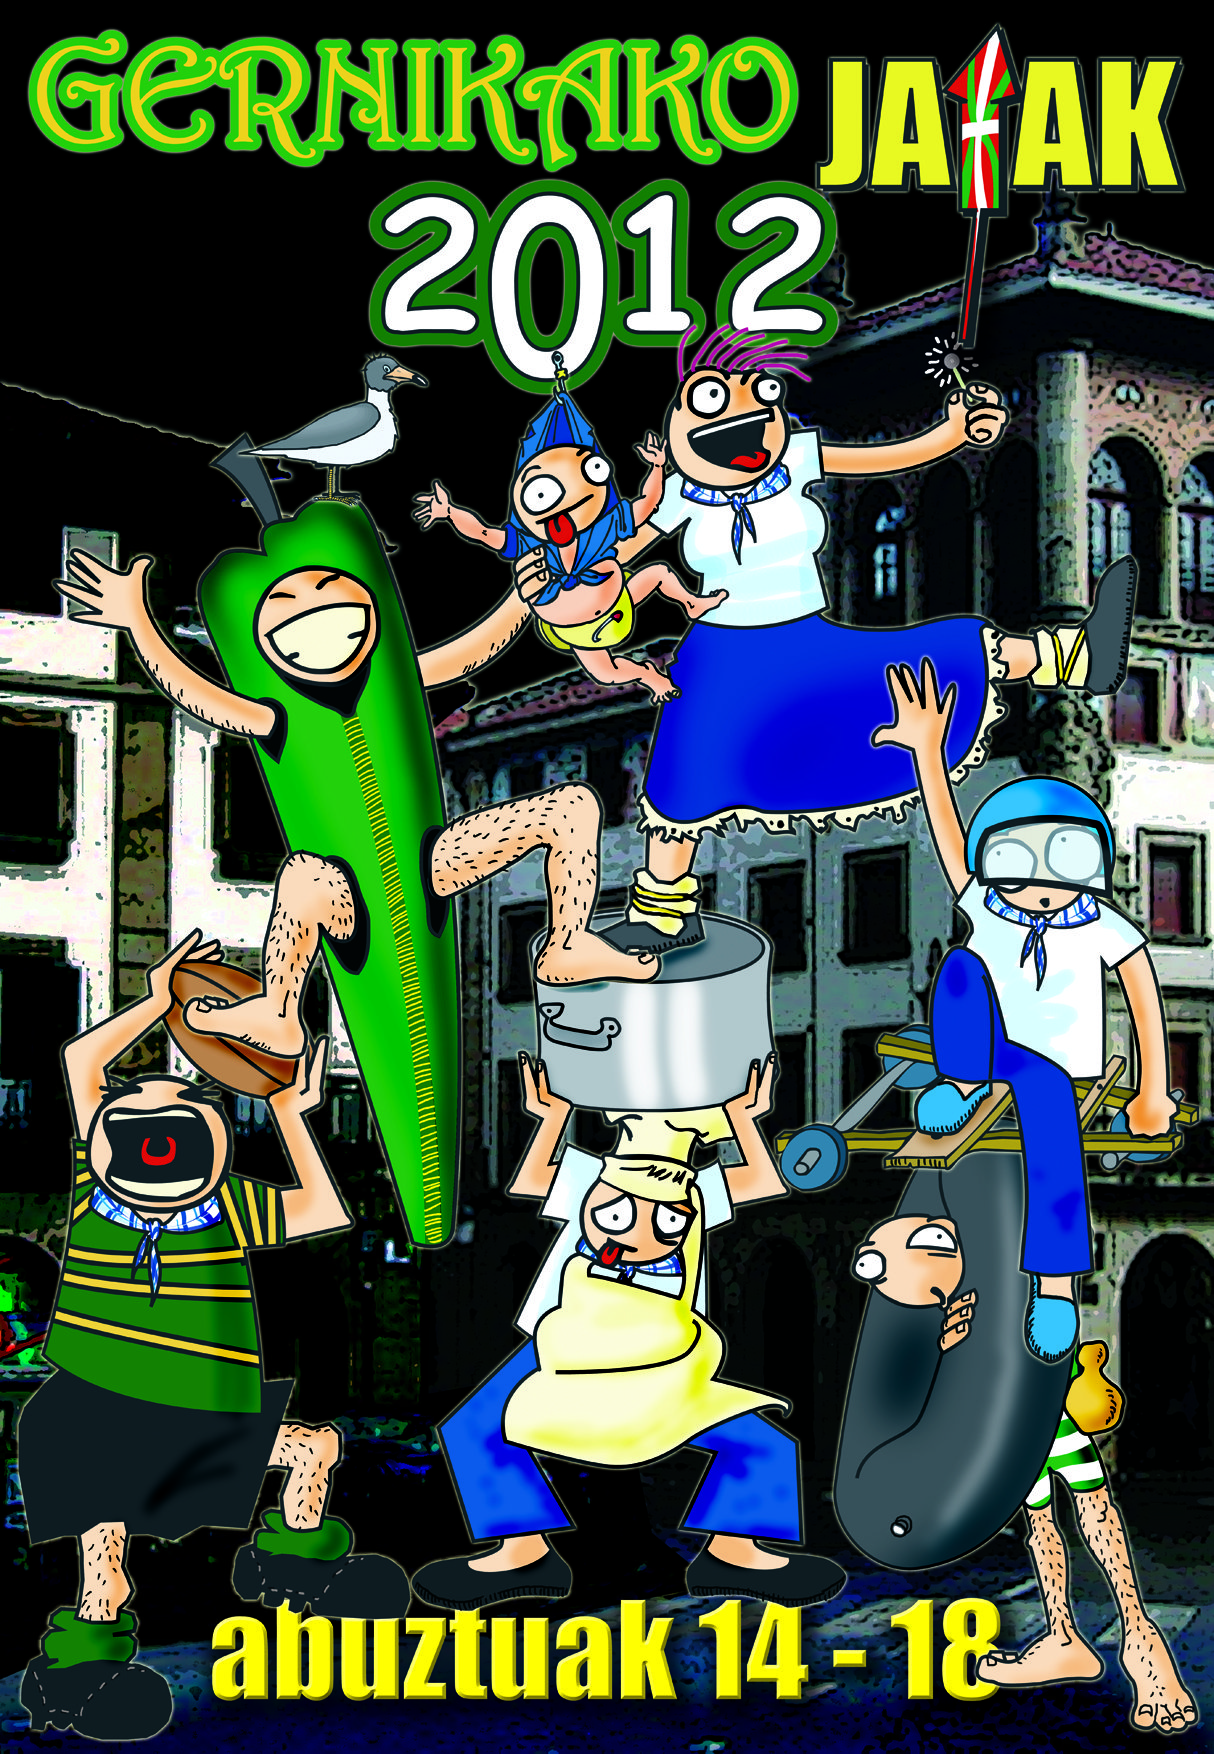 2012 Gernika 2012(p)